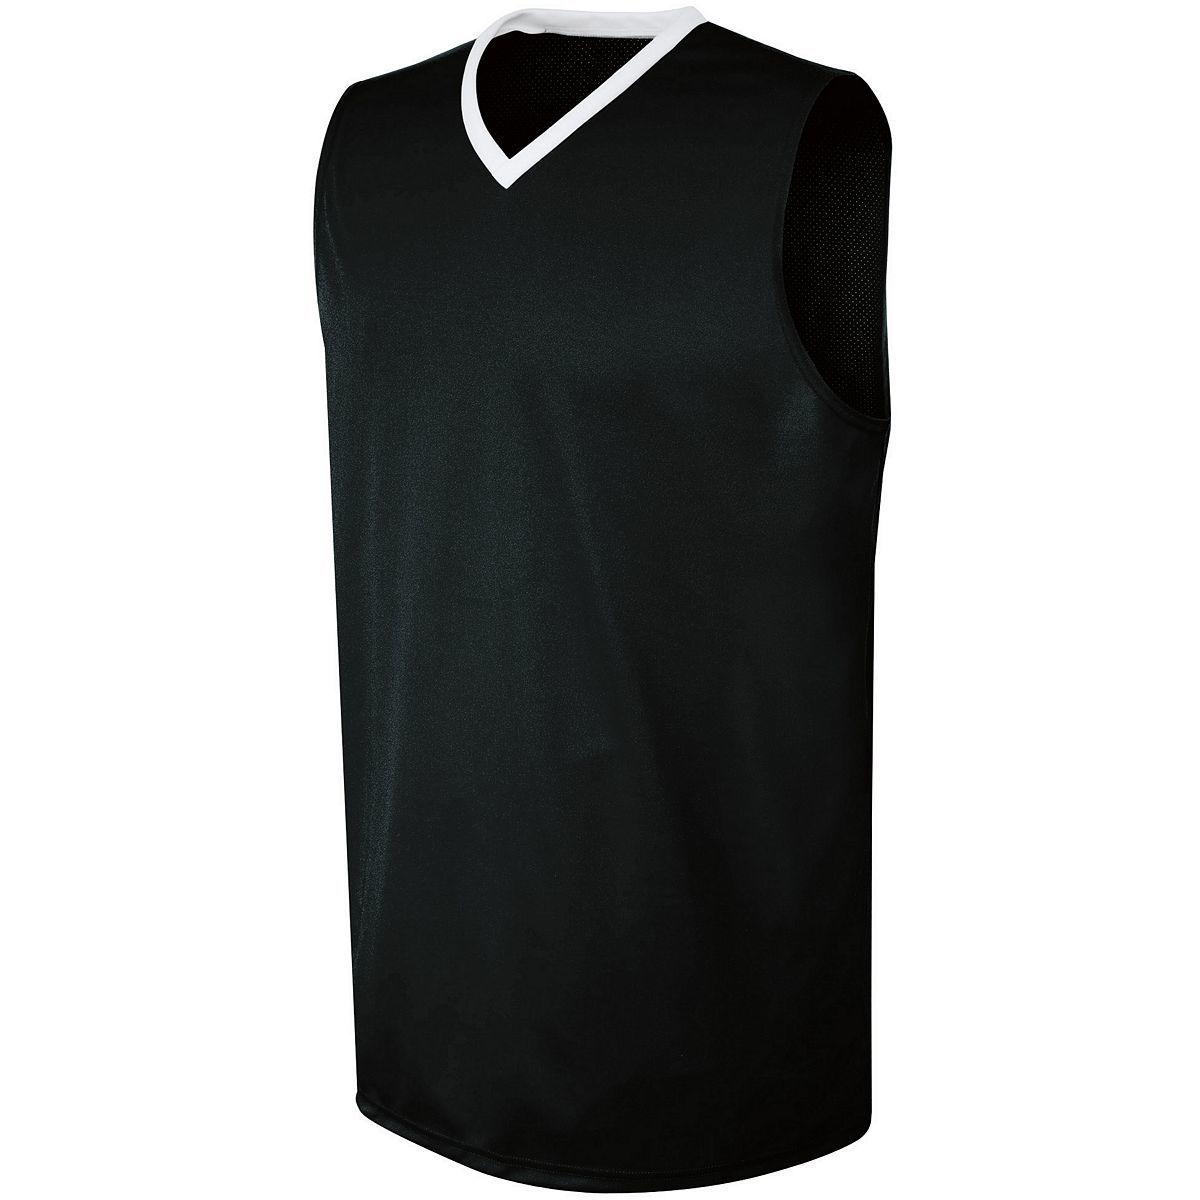 Ladies Transition Jersey - BLACK/WHITE